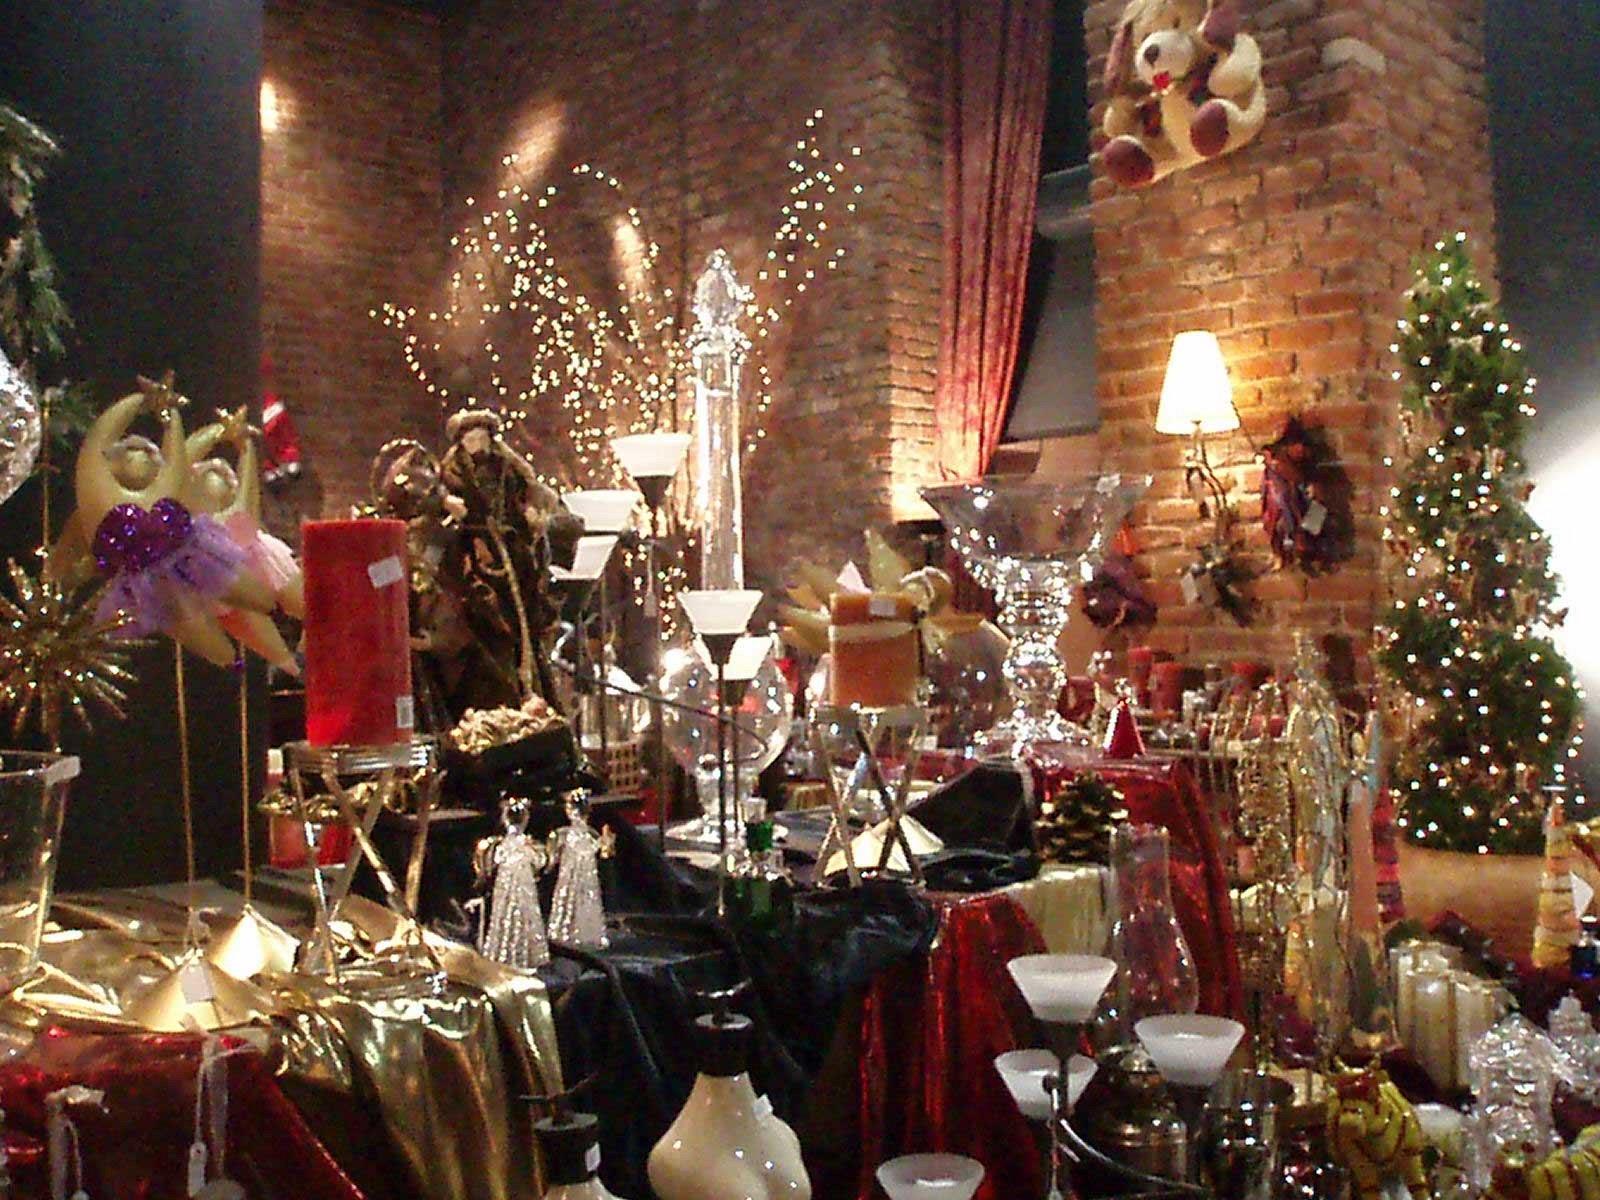 Christmas In German.German Christmas Bazaar Weihnachtsbasar Beirut Lebtivity